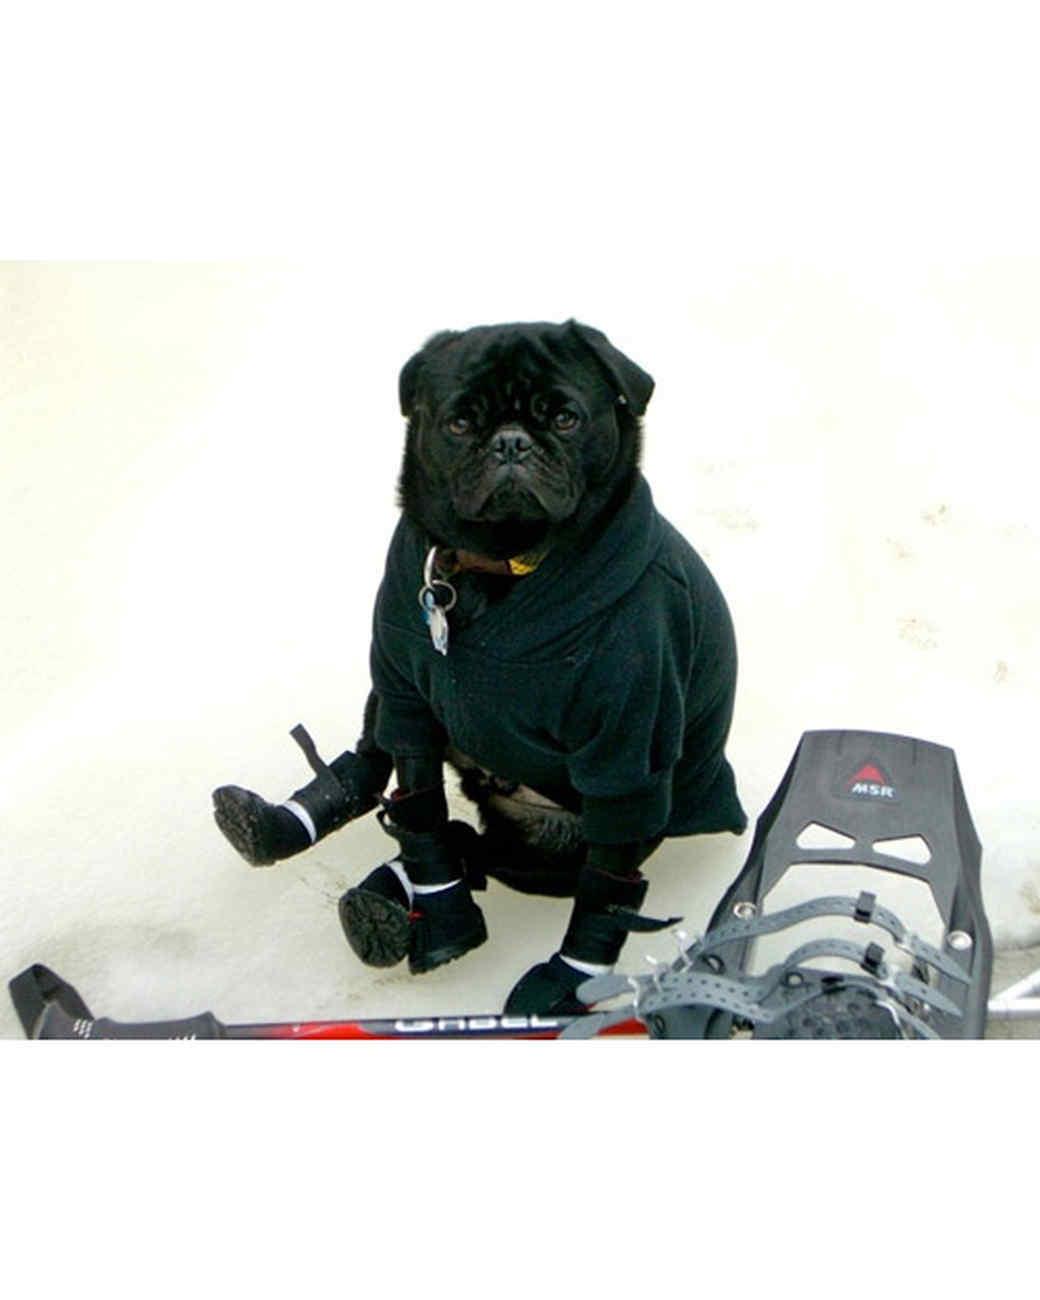 pets_snowangels_7004462_122717_18788028.jpg